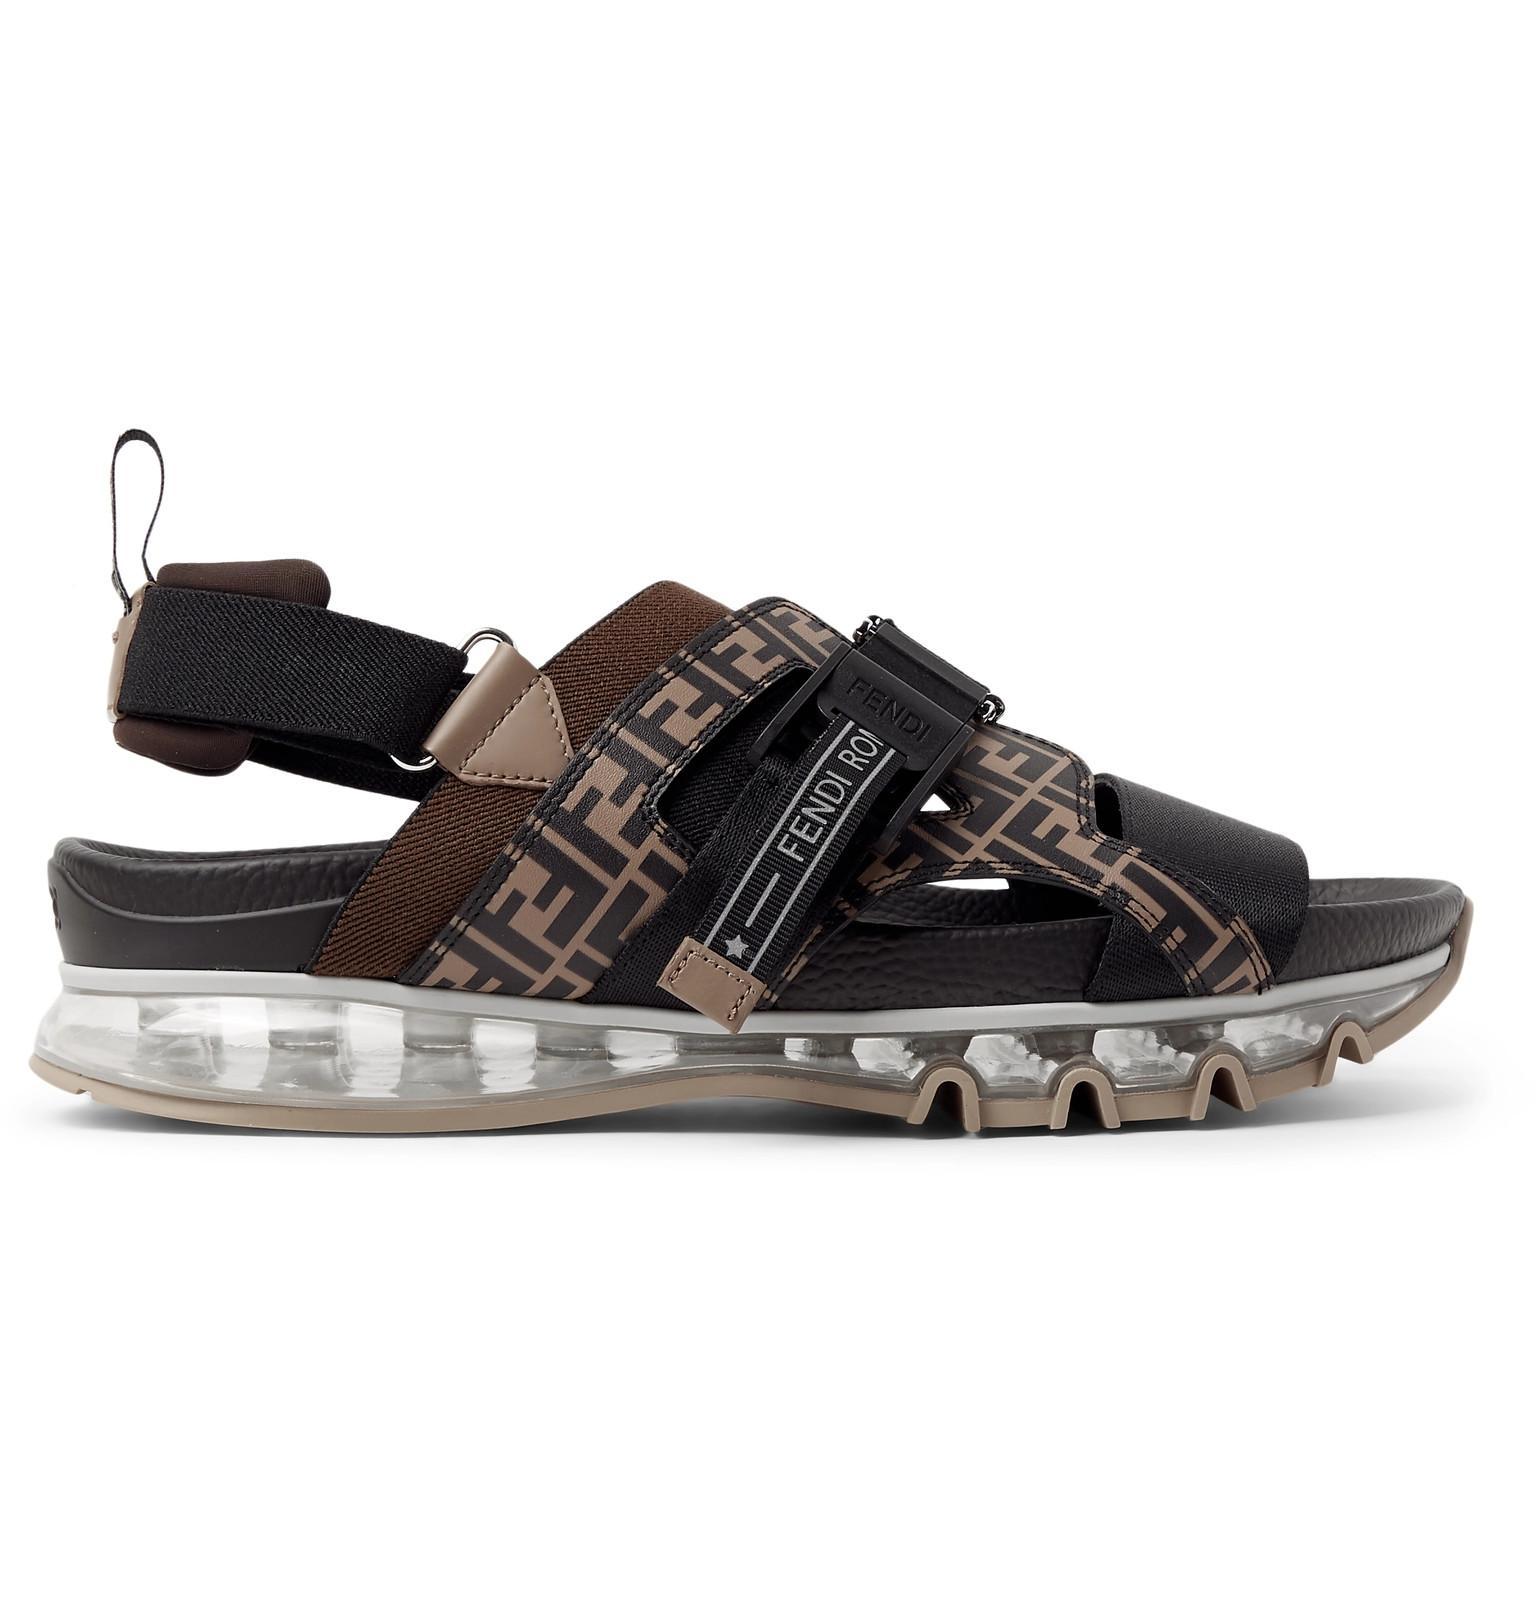 c1638fdf1 Fendi - Brown Logo-print Leather And Webbing Sandals for Men - Lyst. View  fullscreen